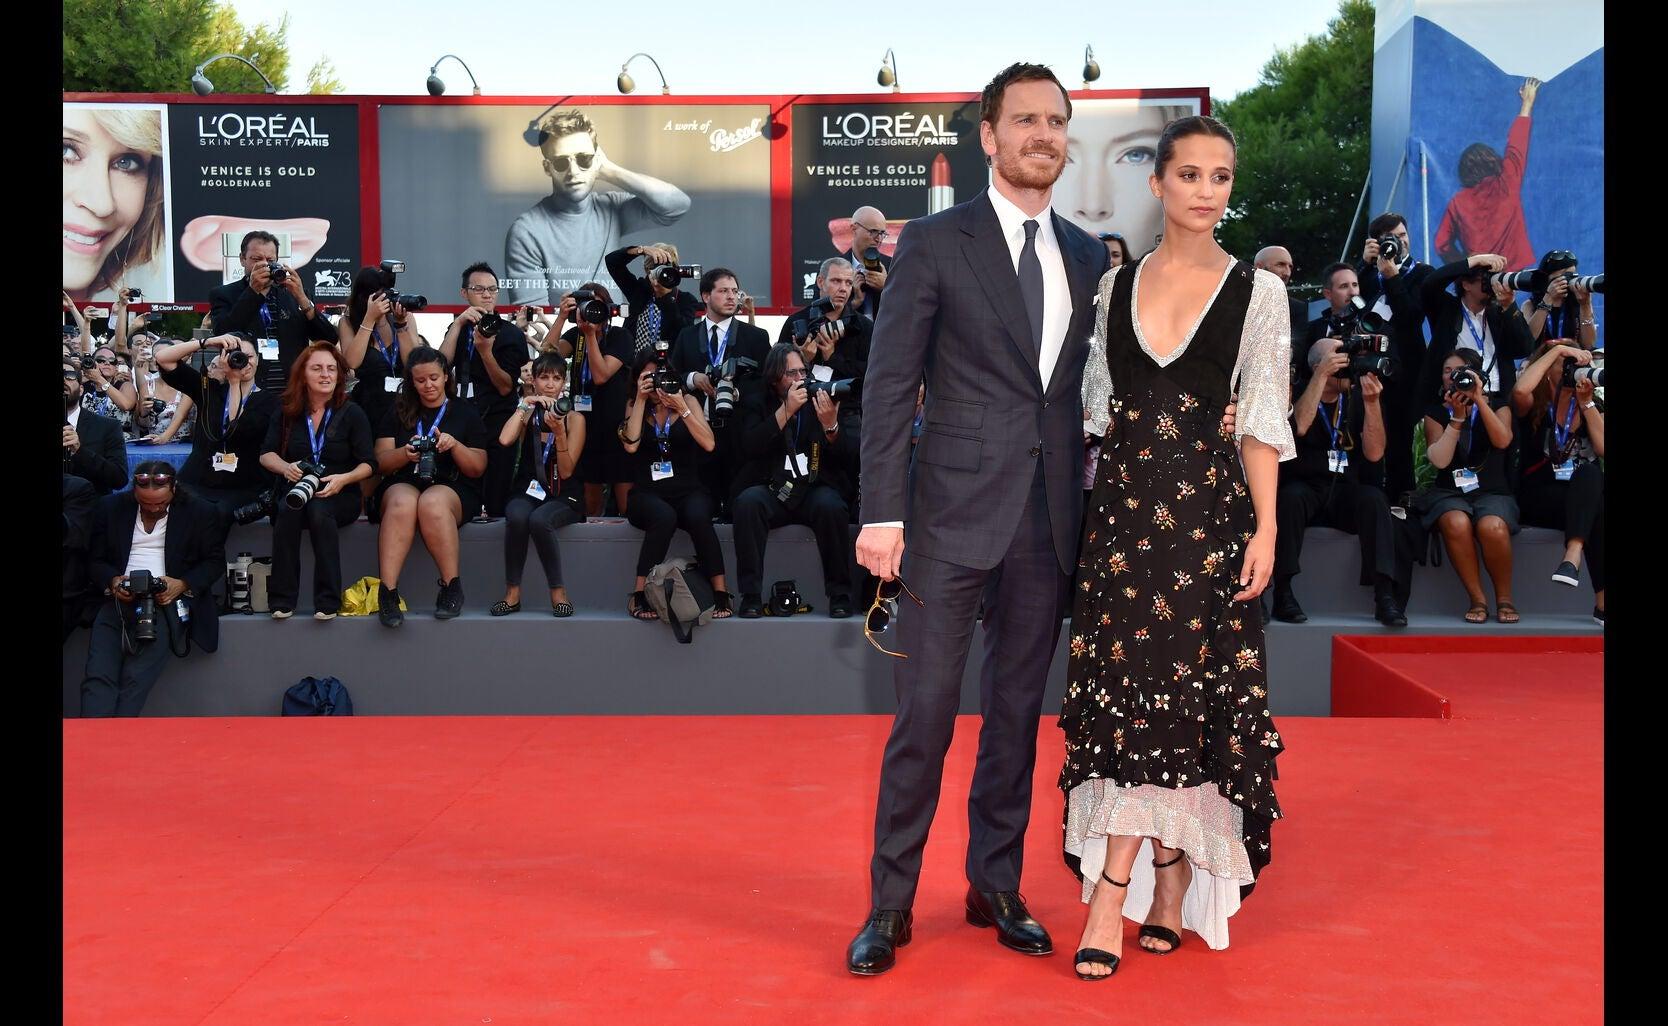 Actors Alicia Vikander and Michael Fassbender, Golden Globe nominees, in Venice 2016